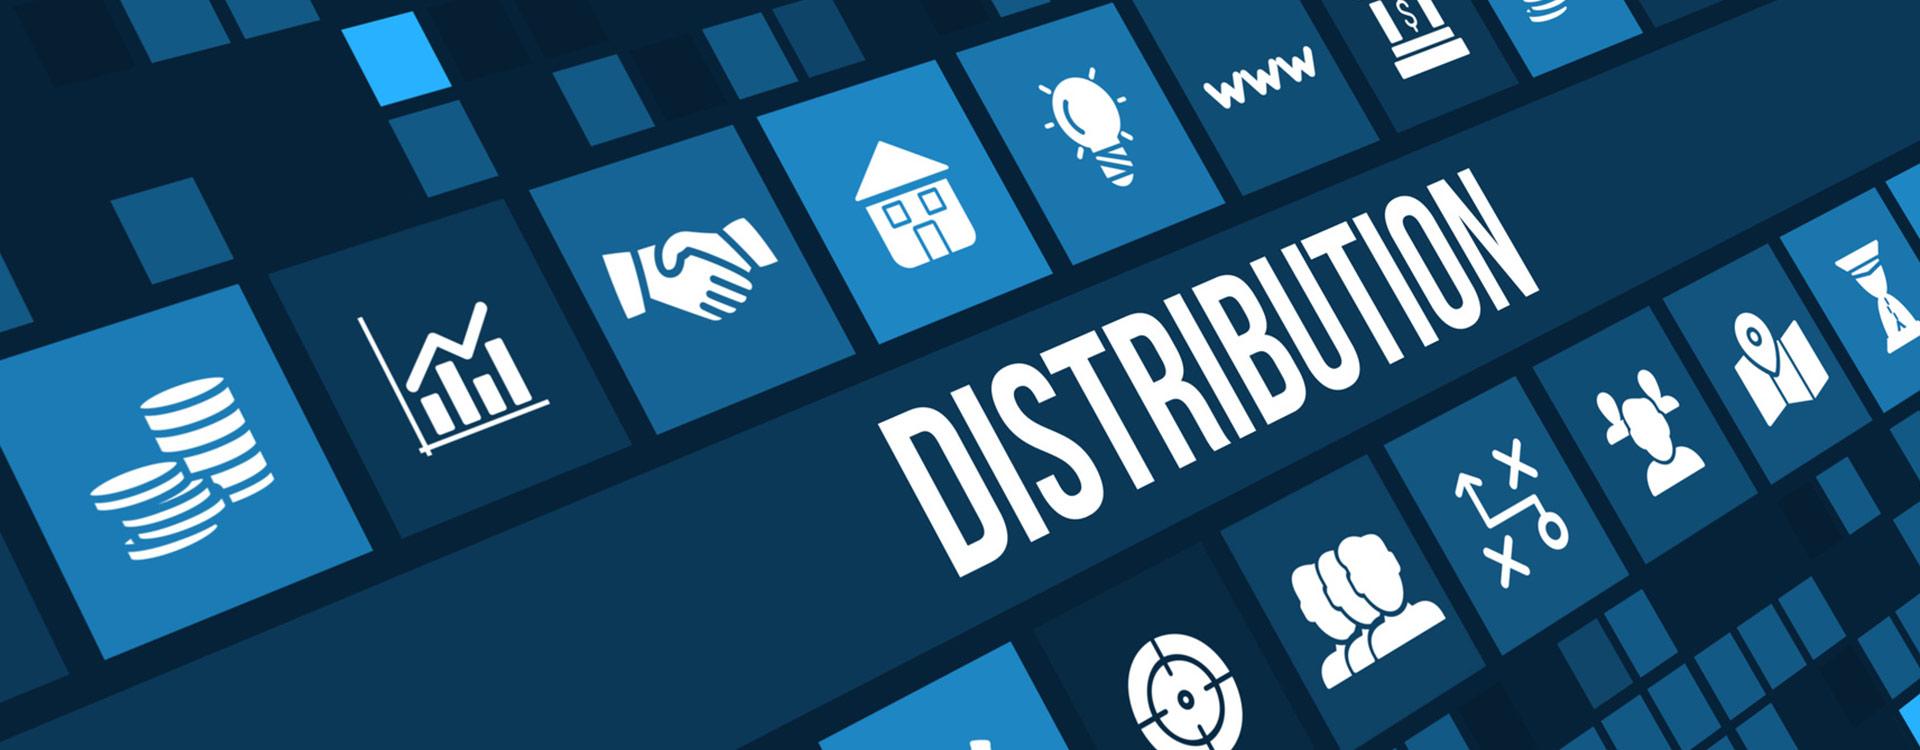 pixior distribution